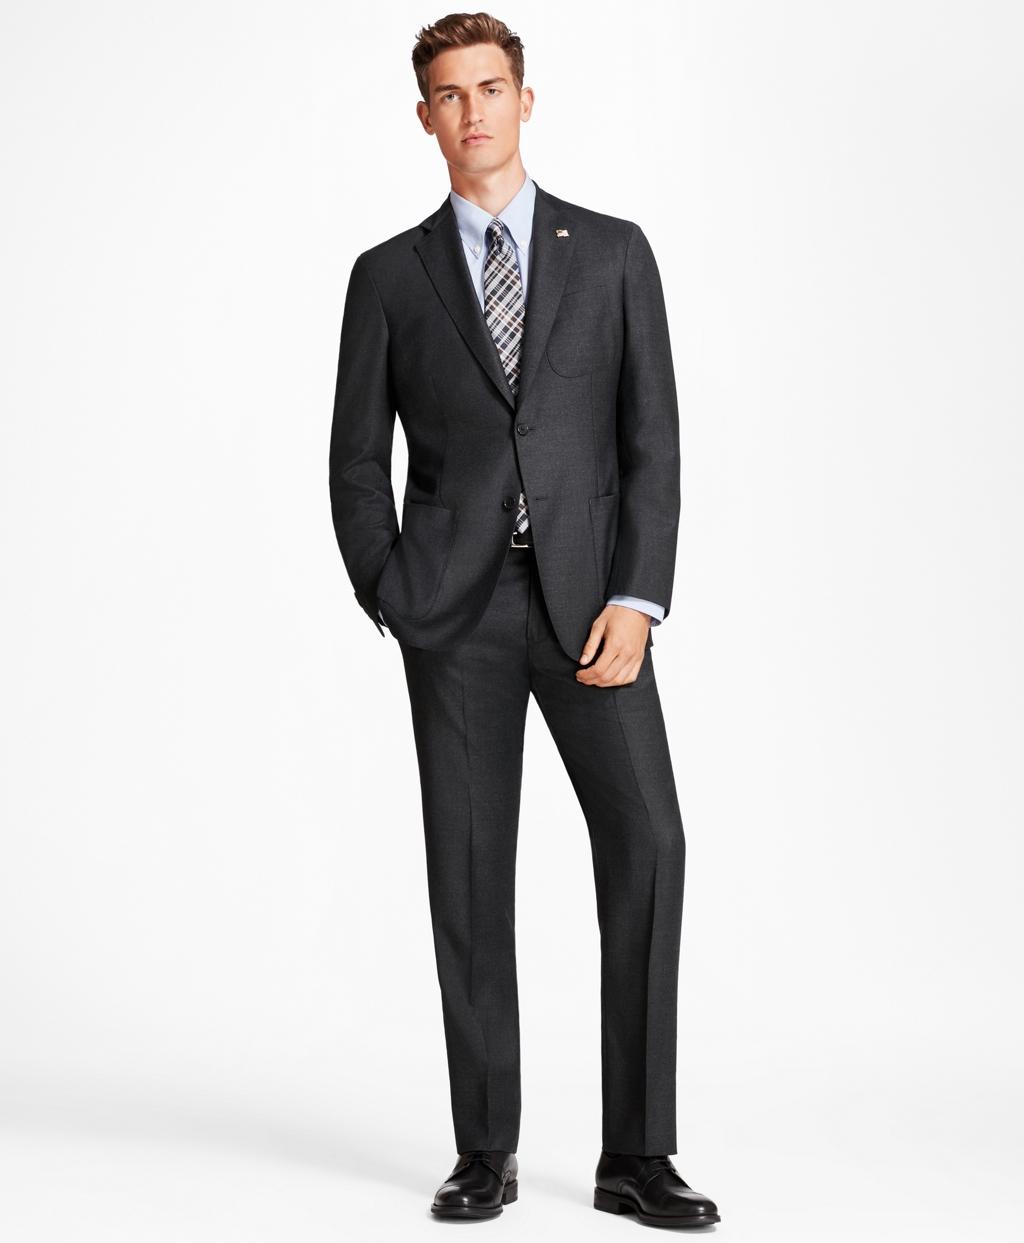 cc58eca0e6 Regent Fit BrooksCloud™ Neat 1818 Suit - Brooks Brothers